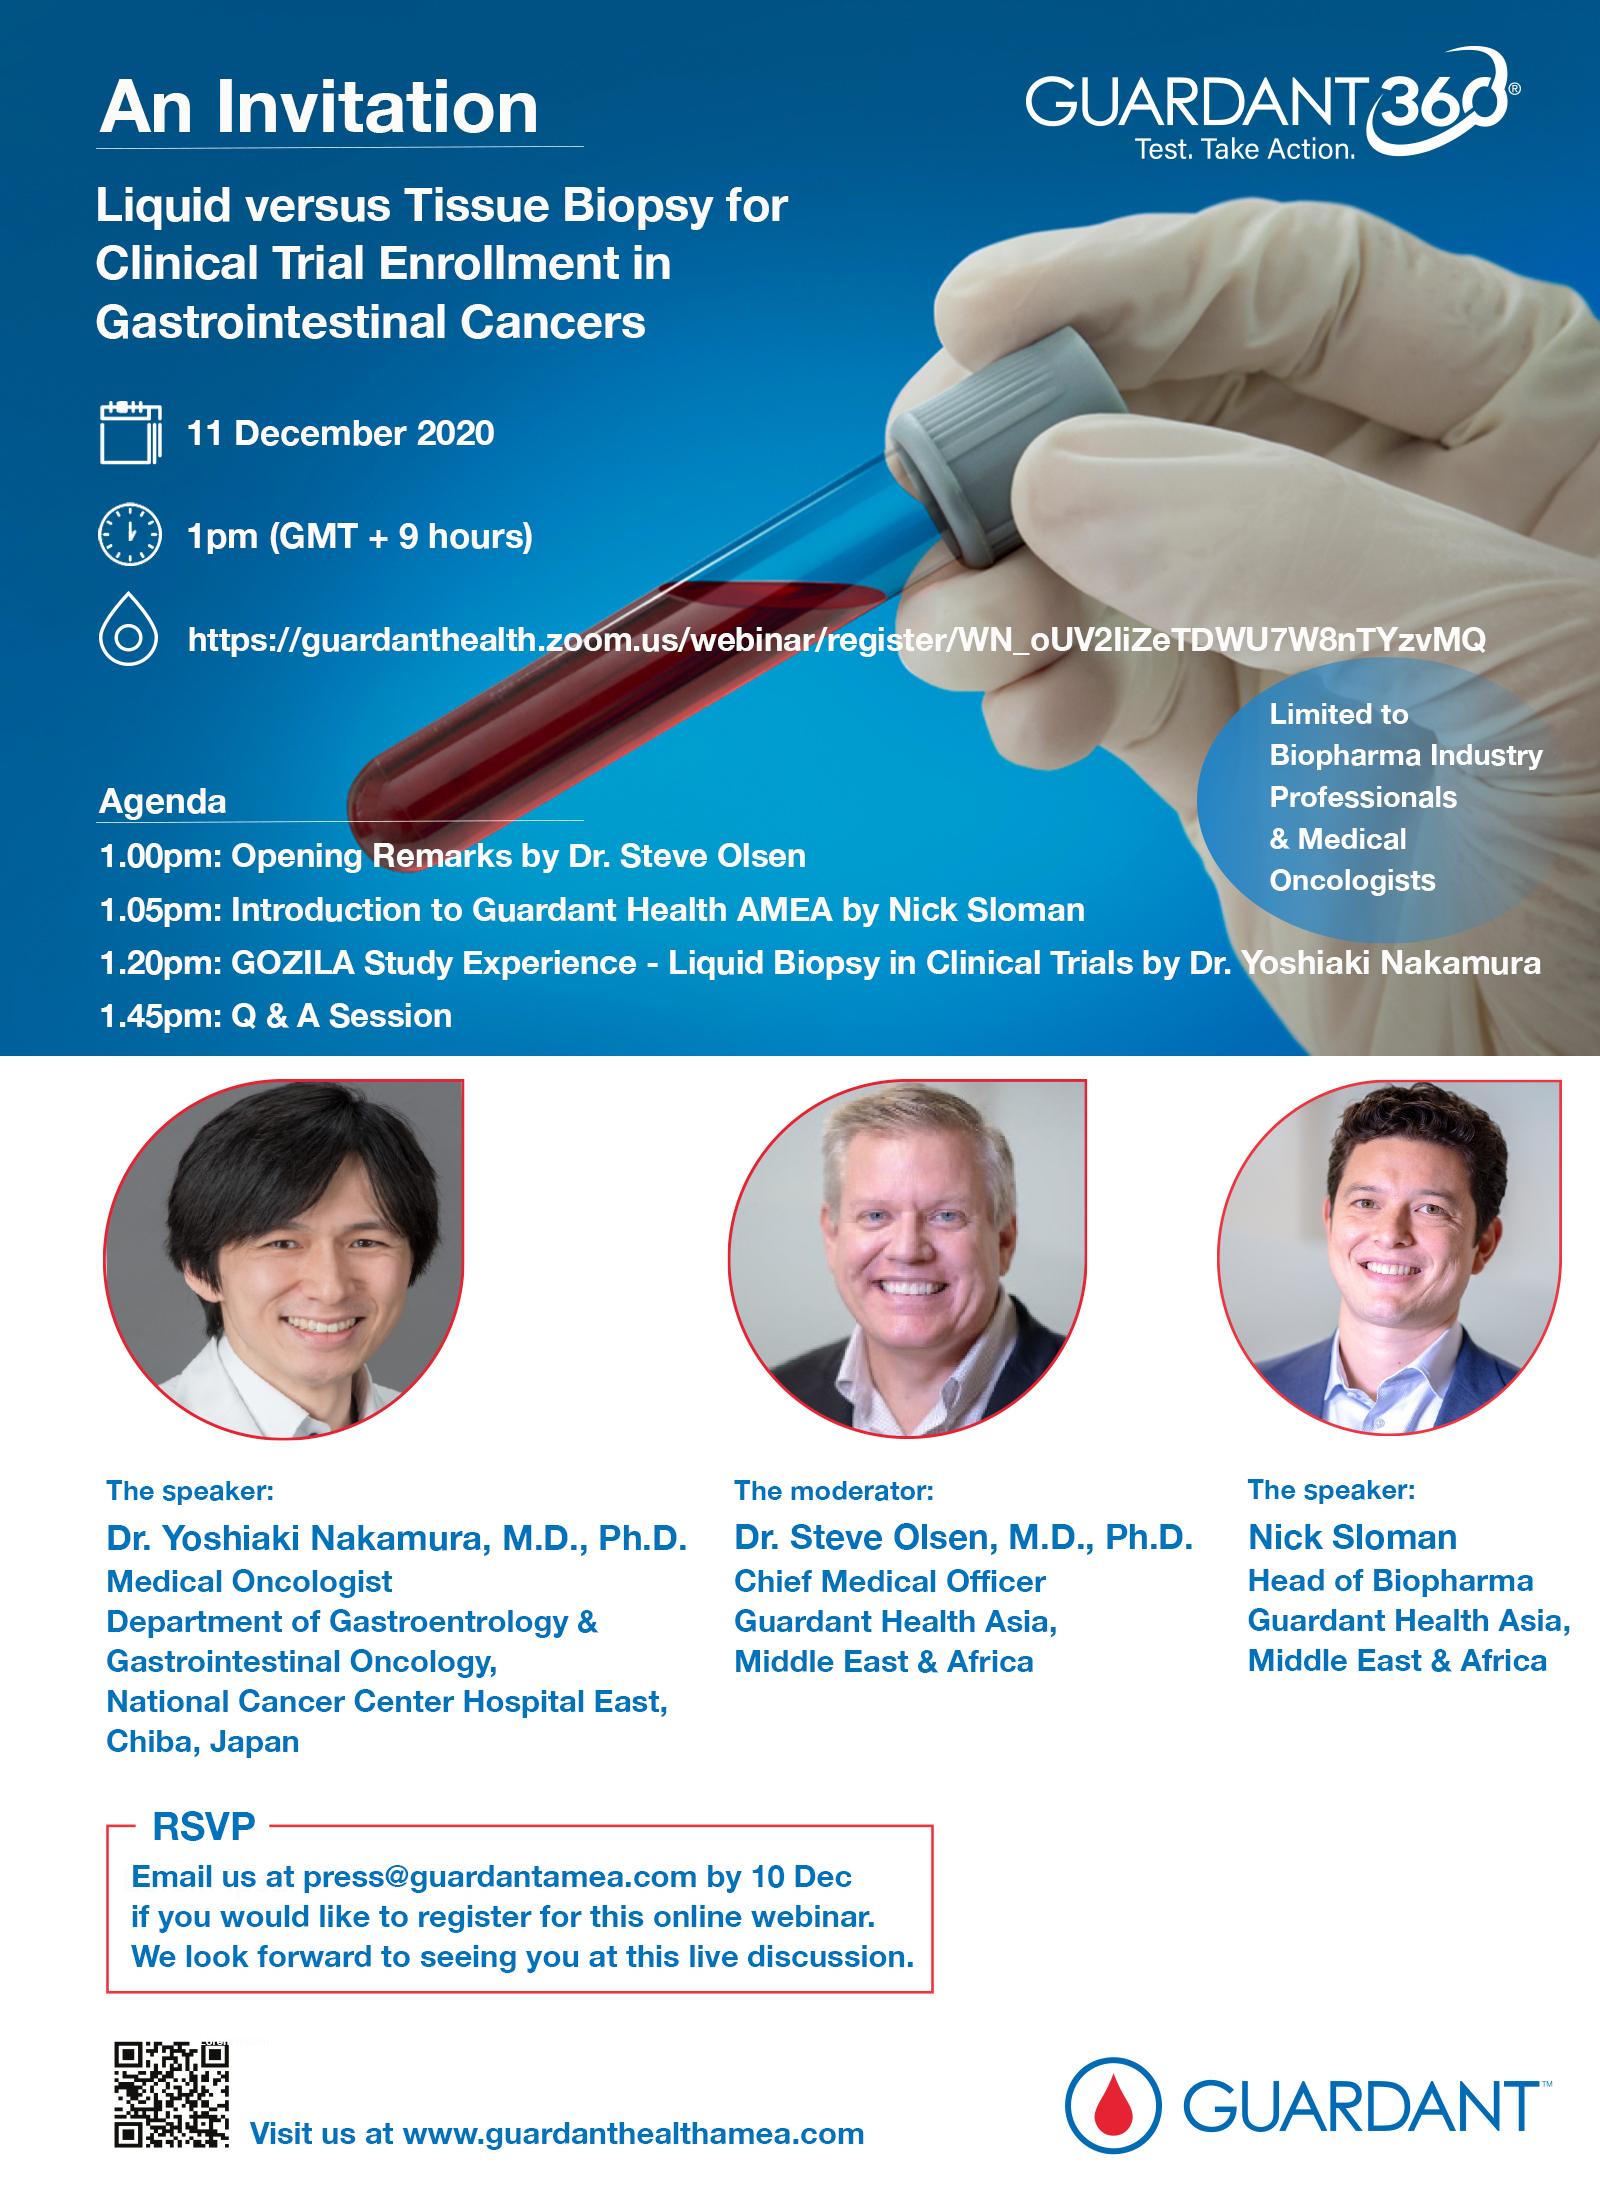 Liquid versus Tissue Biopsy for Clinical Trial Enrollment in Gastrointestinal Cancers (Webinar)